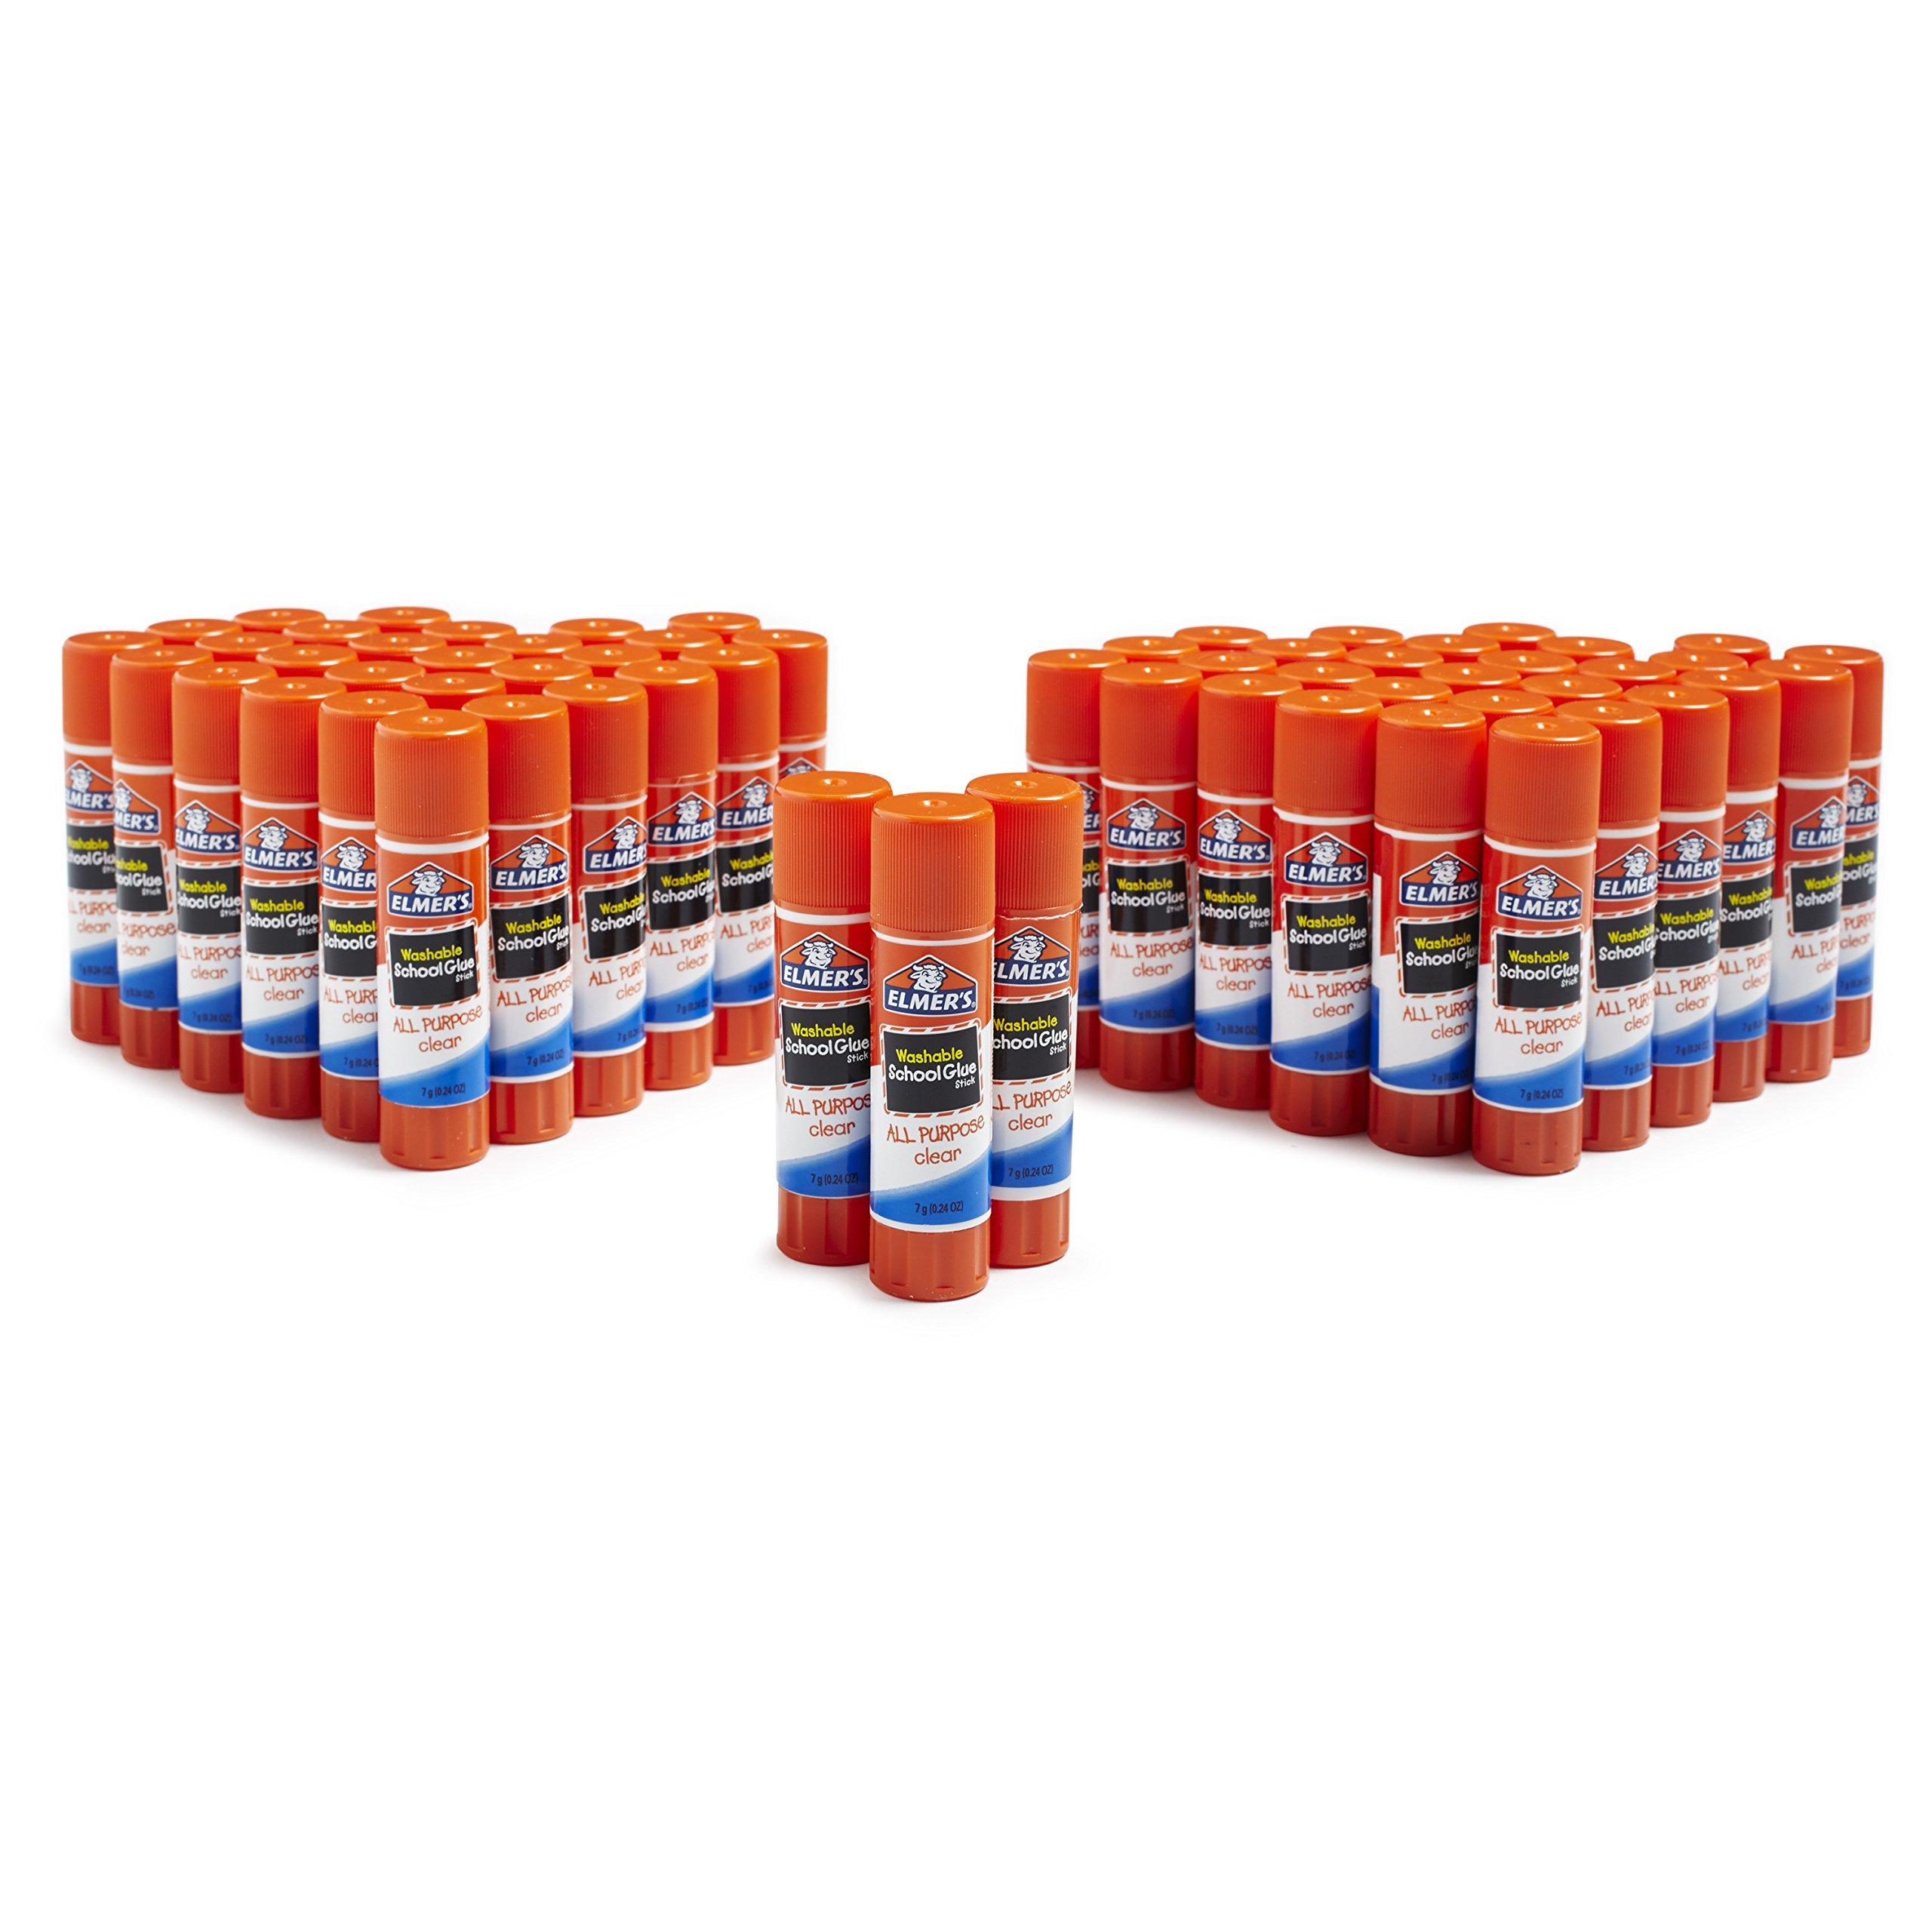 Elmer's All Purpose School Glue Sticks, Washable, 60 Pack, 0.24-ounce sticks by Elmer's (Image #2)